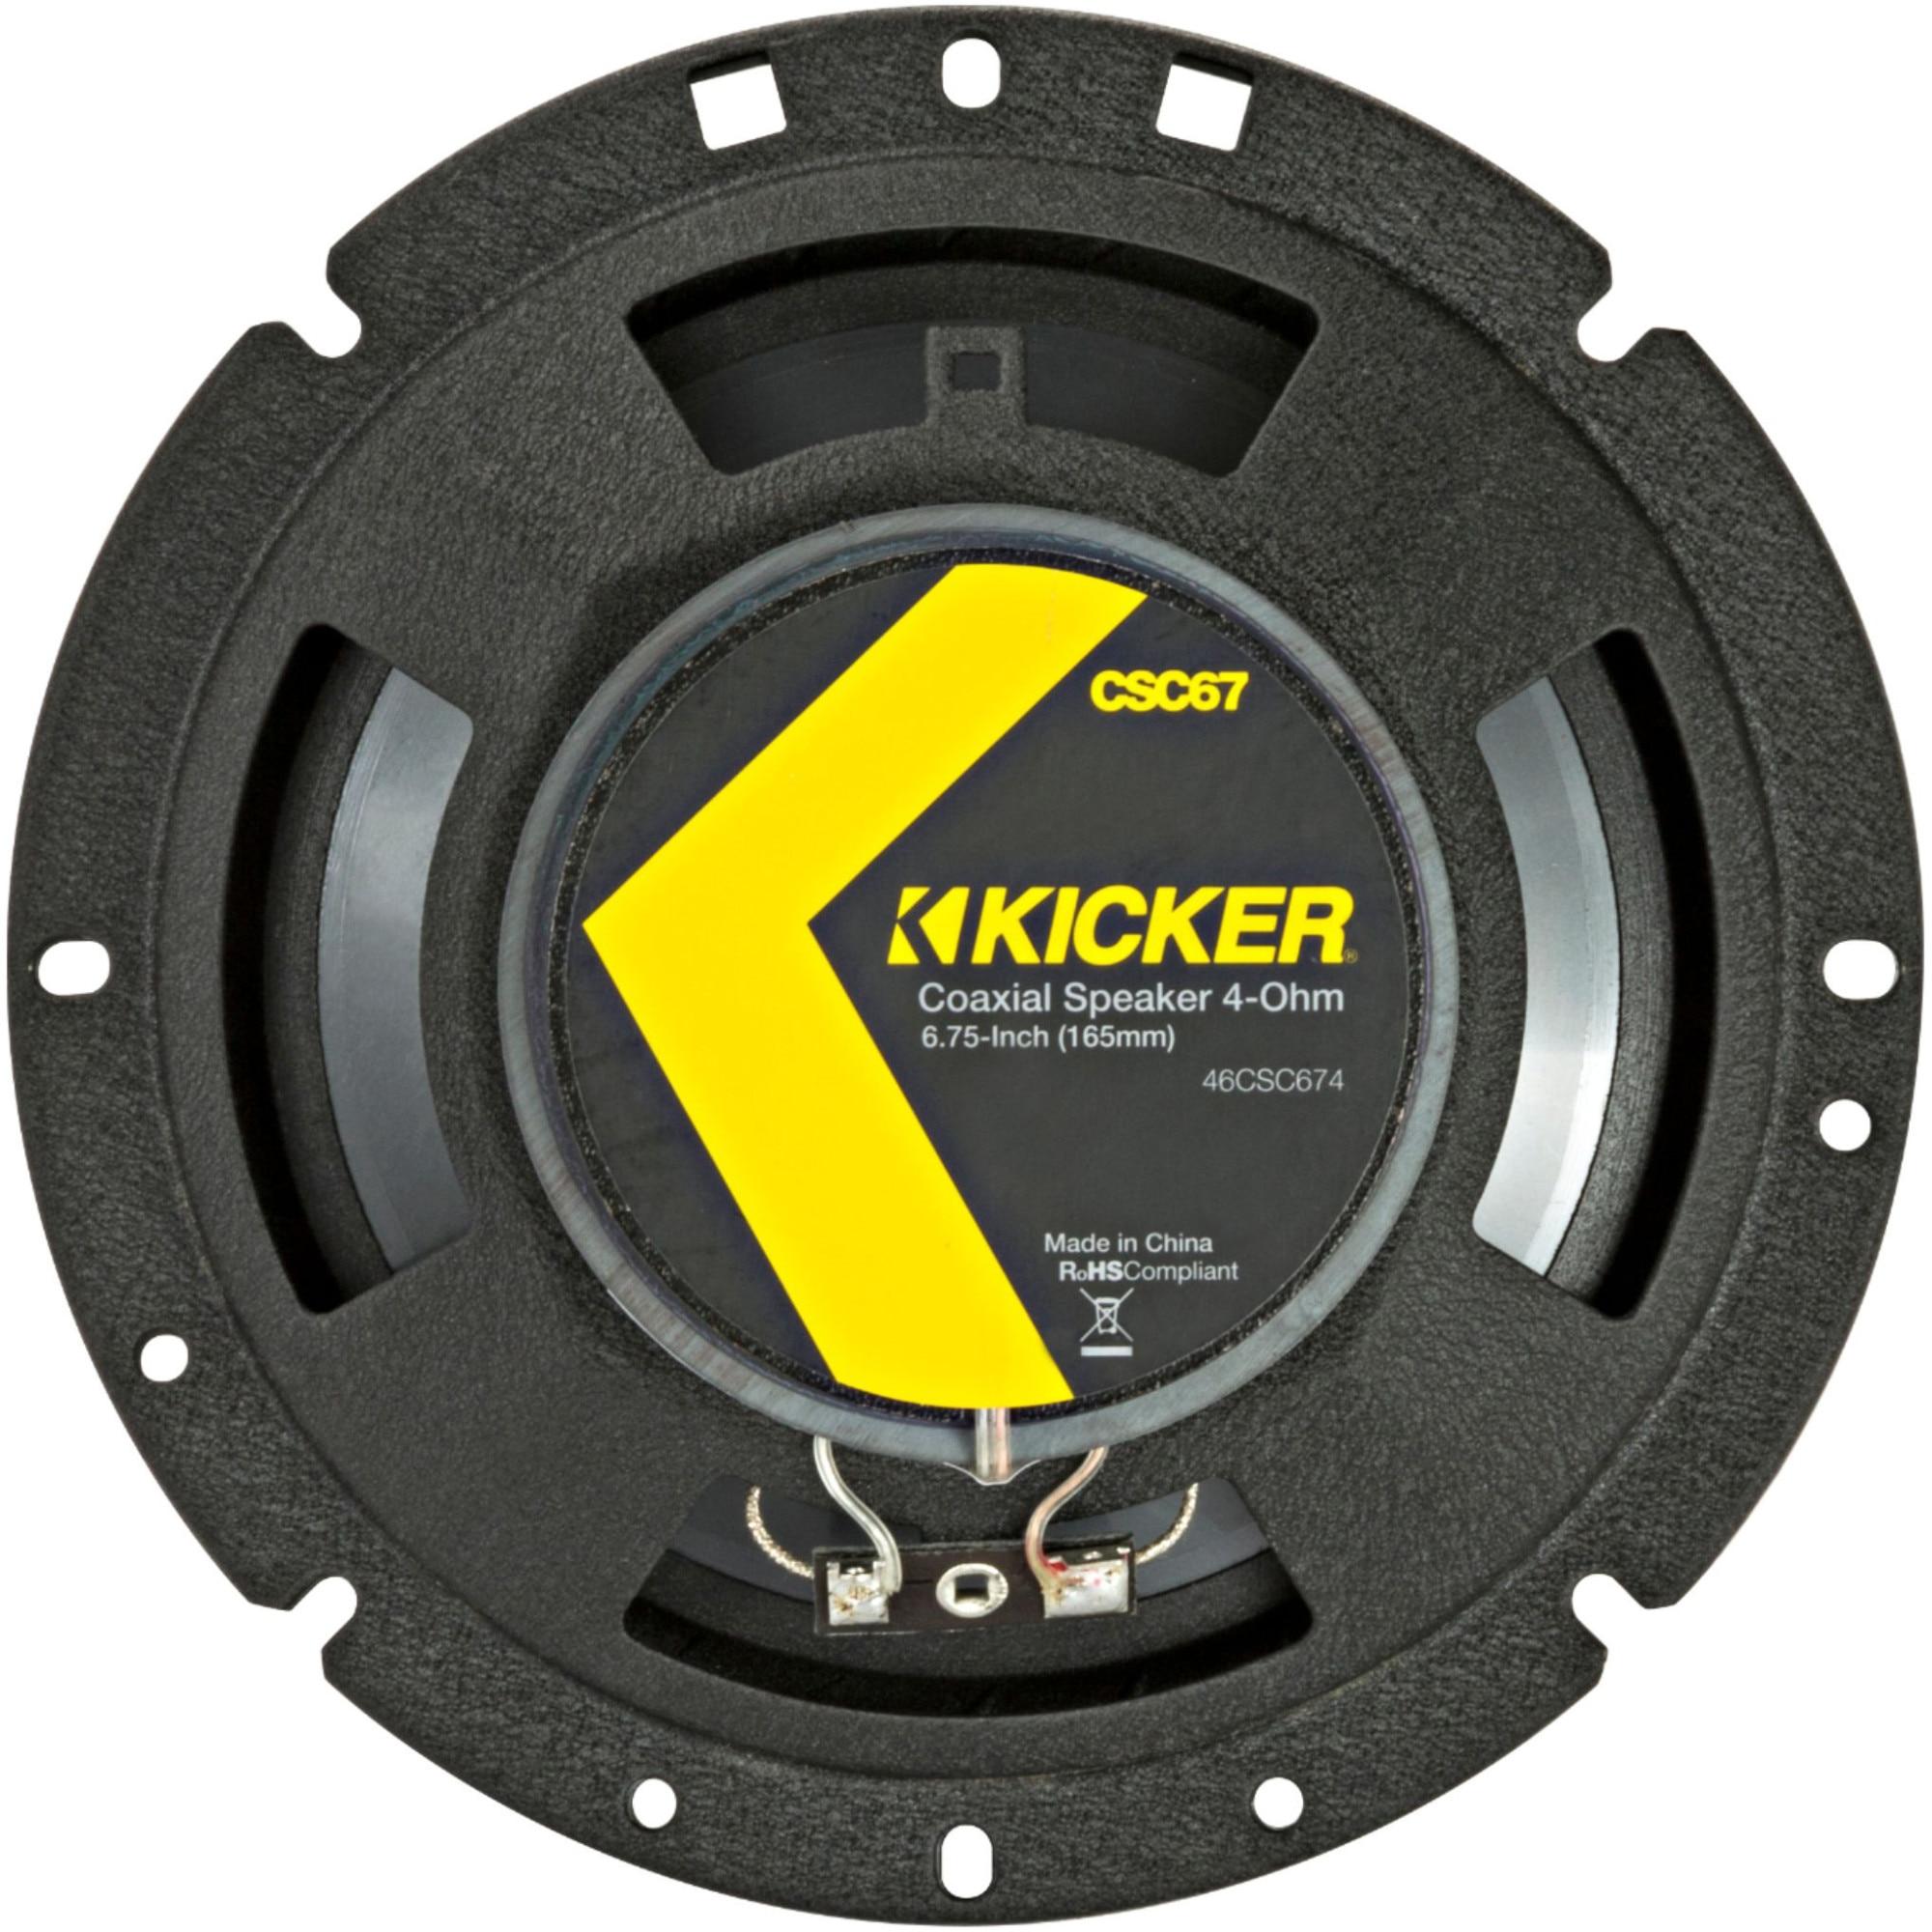 "Fotografie Difuzoare coaxiale Kicker 17 cm (6-3/4""), 2 cai, 300W/100W"